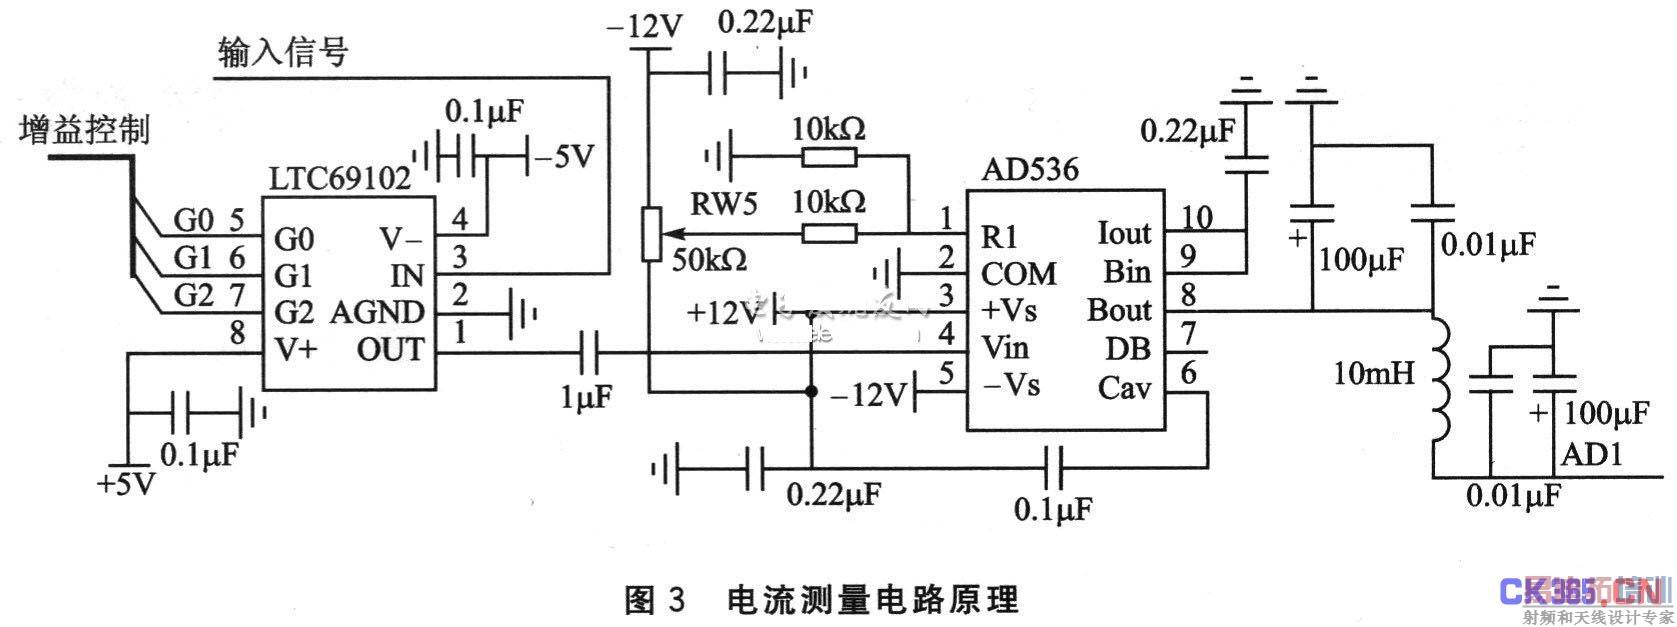 2.3 RS485电路   图4所示的单片机与RS485通信转换电路中,通过3个光耦器件对单片机电路和RS485总线进行隔离,提高系统的抗干扰能力。采用SP485E来支持RS485串行协议,但由于SP485E的工作逻辑是TTL电平,而RS232通信的逻辑电流不是TTL电平,需要通过SP232器件进行电平转换,如图5所示。RS485工作在半双工通信状态,通过CTR485控制数据的输入/输出方向。